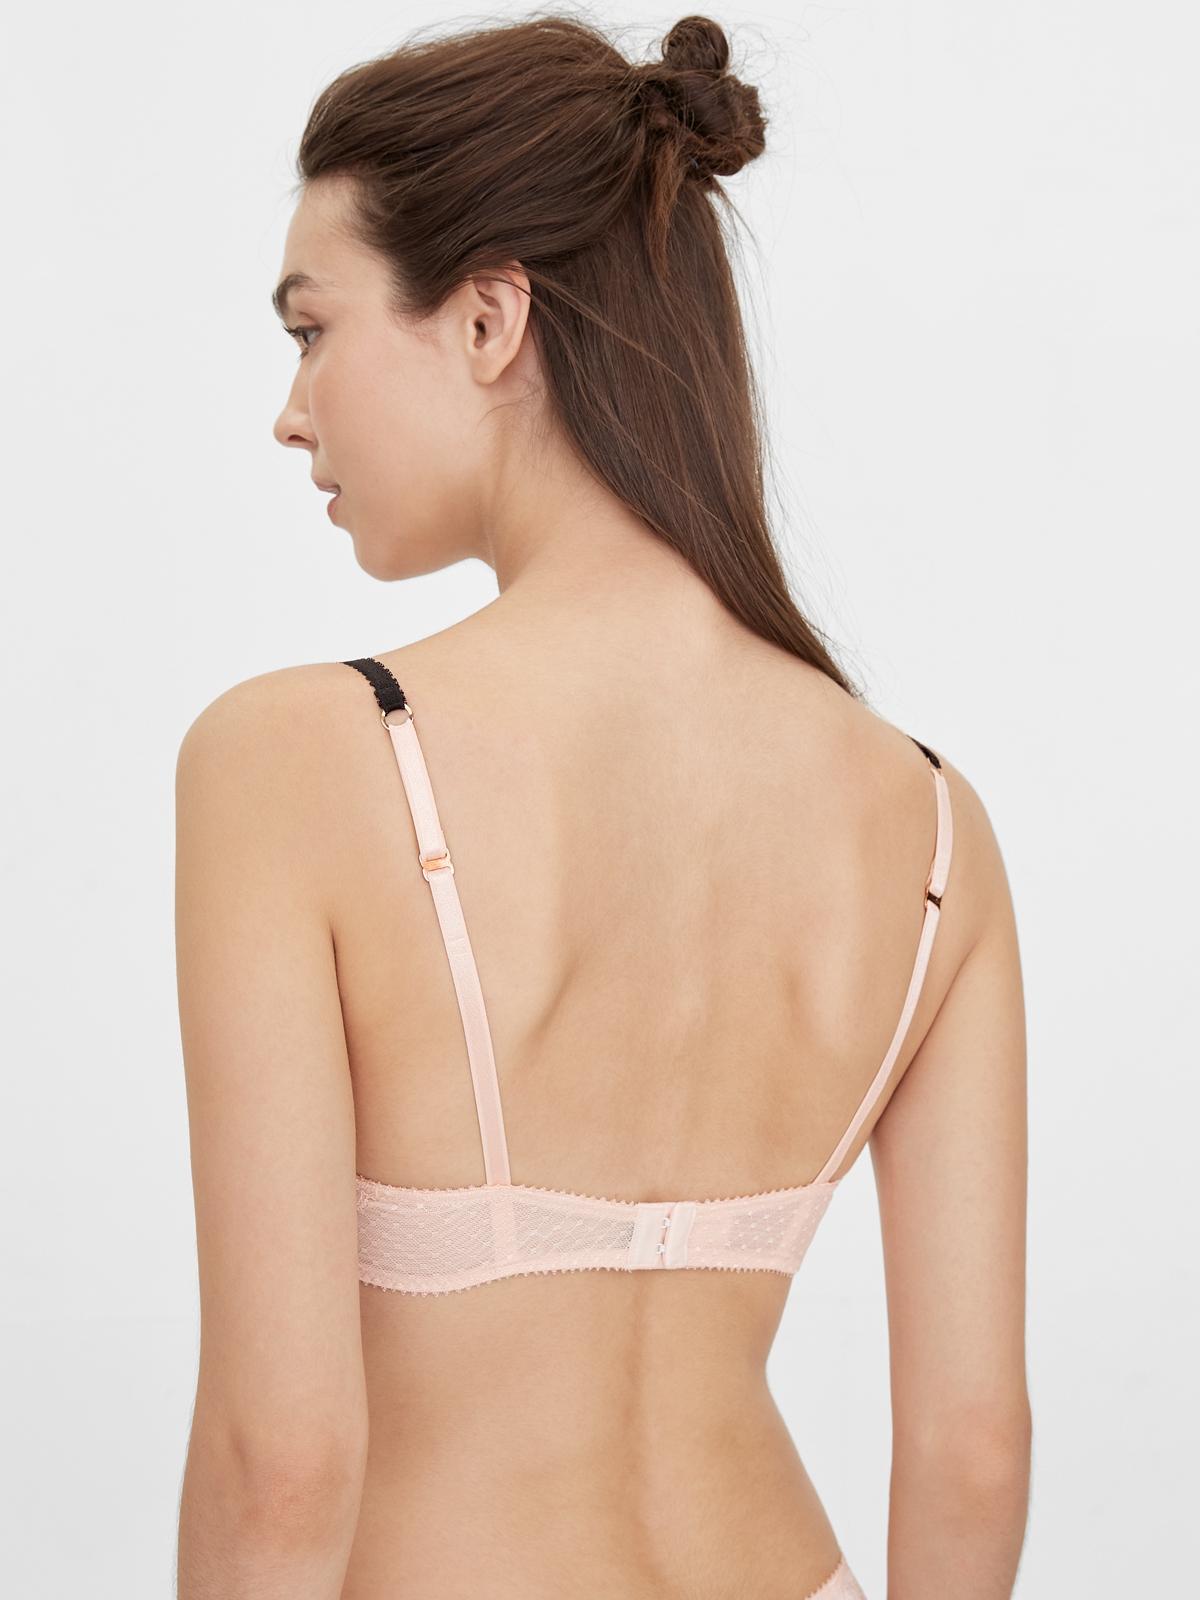 Boudoir By Disaya Juliette Premium Lace Mold Bra Nude